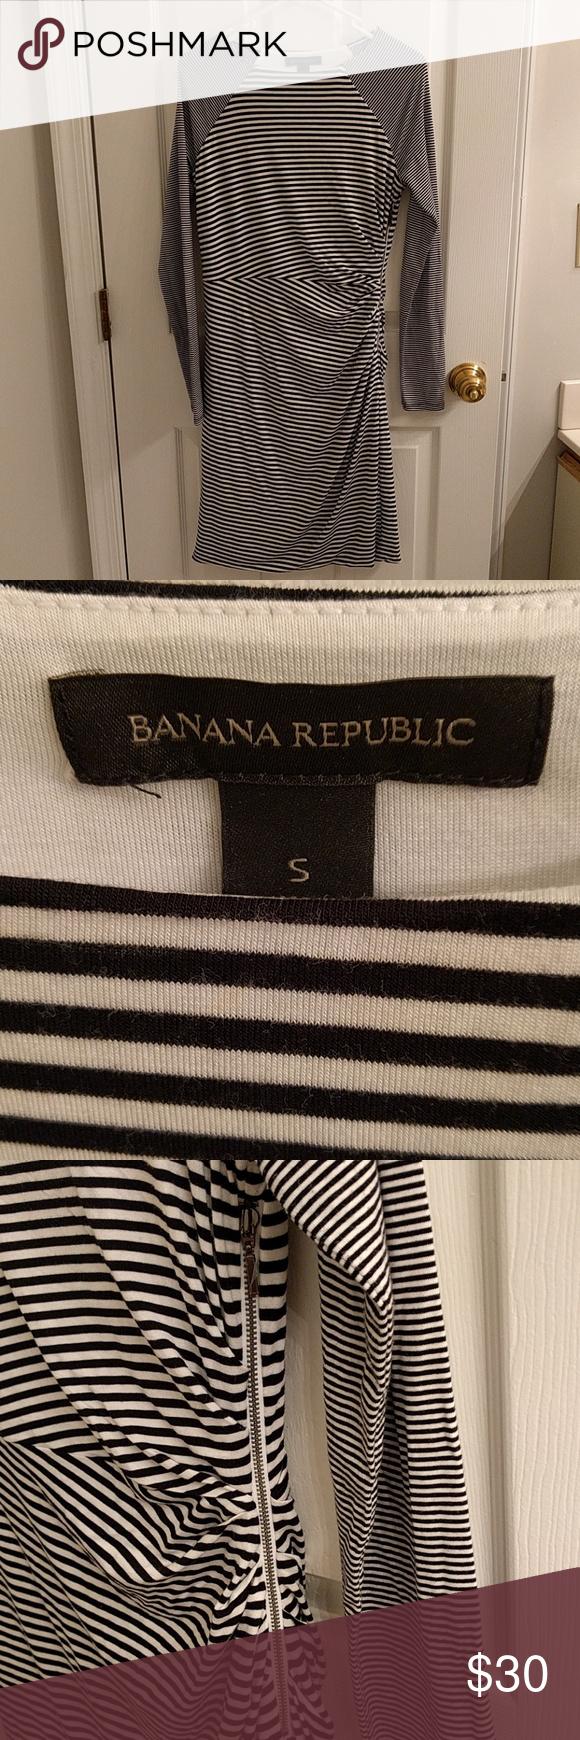 NWOT Banana Republic Dress Super flattering, exposed zipper on the side, appropriate length for the office. Banana Republic Dresses